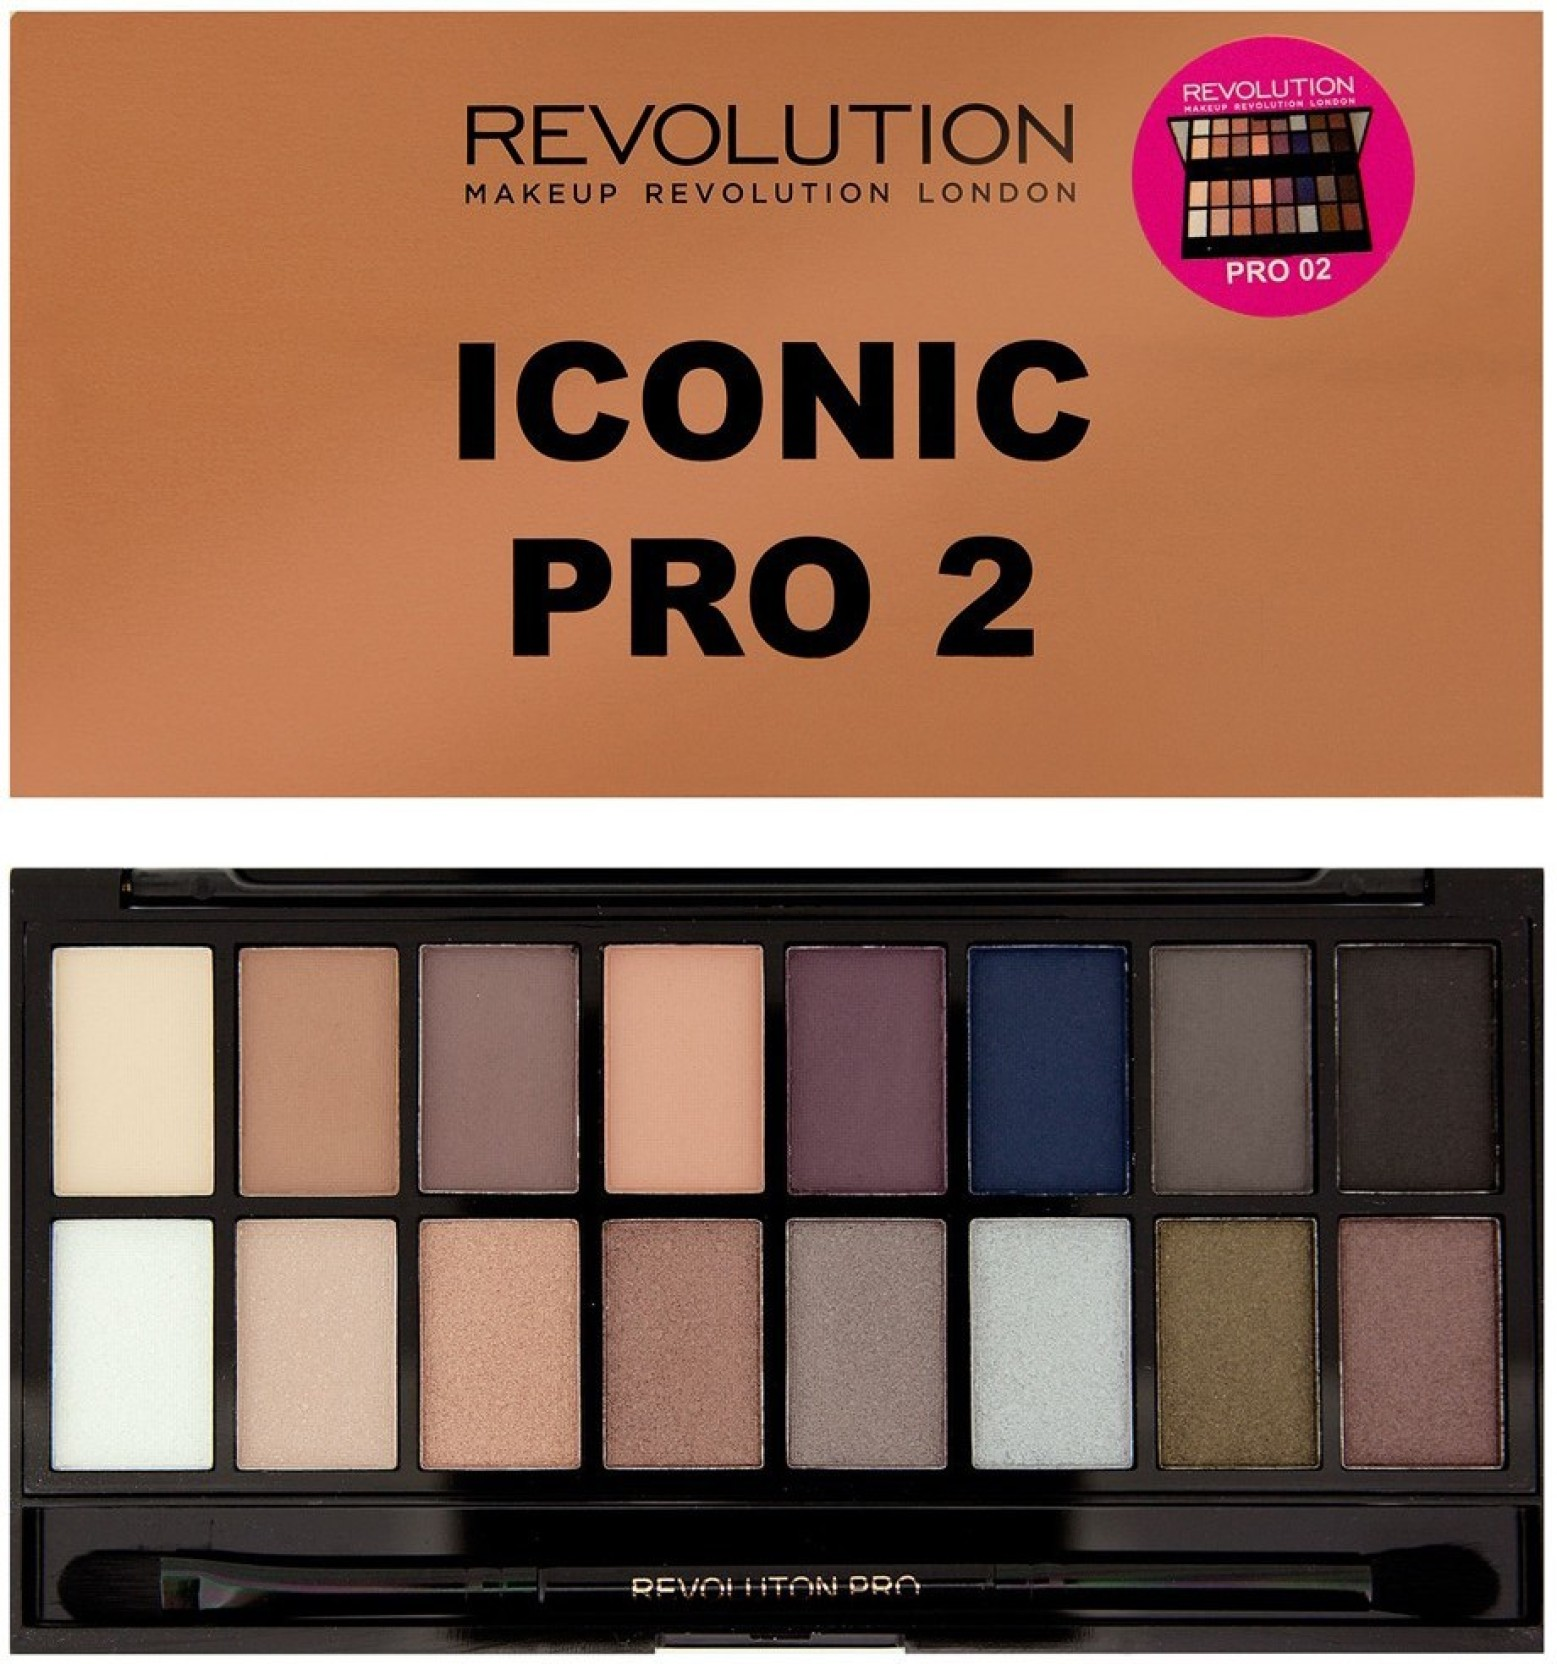 Makeup Revolution Iconic Pro 2 16 g (Multicolor)